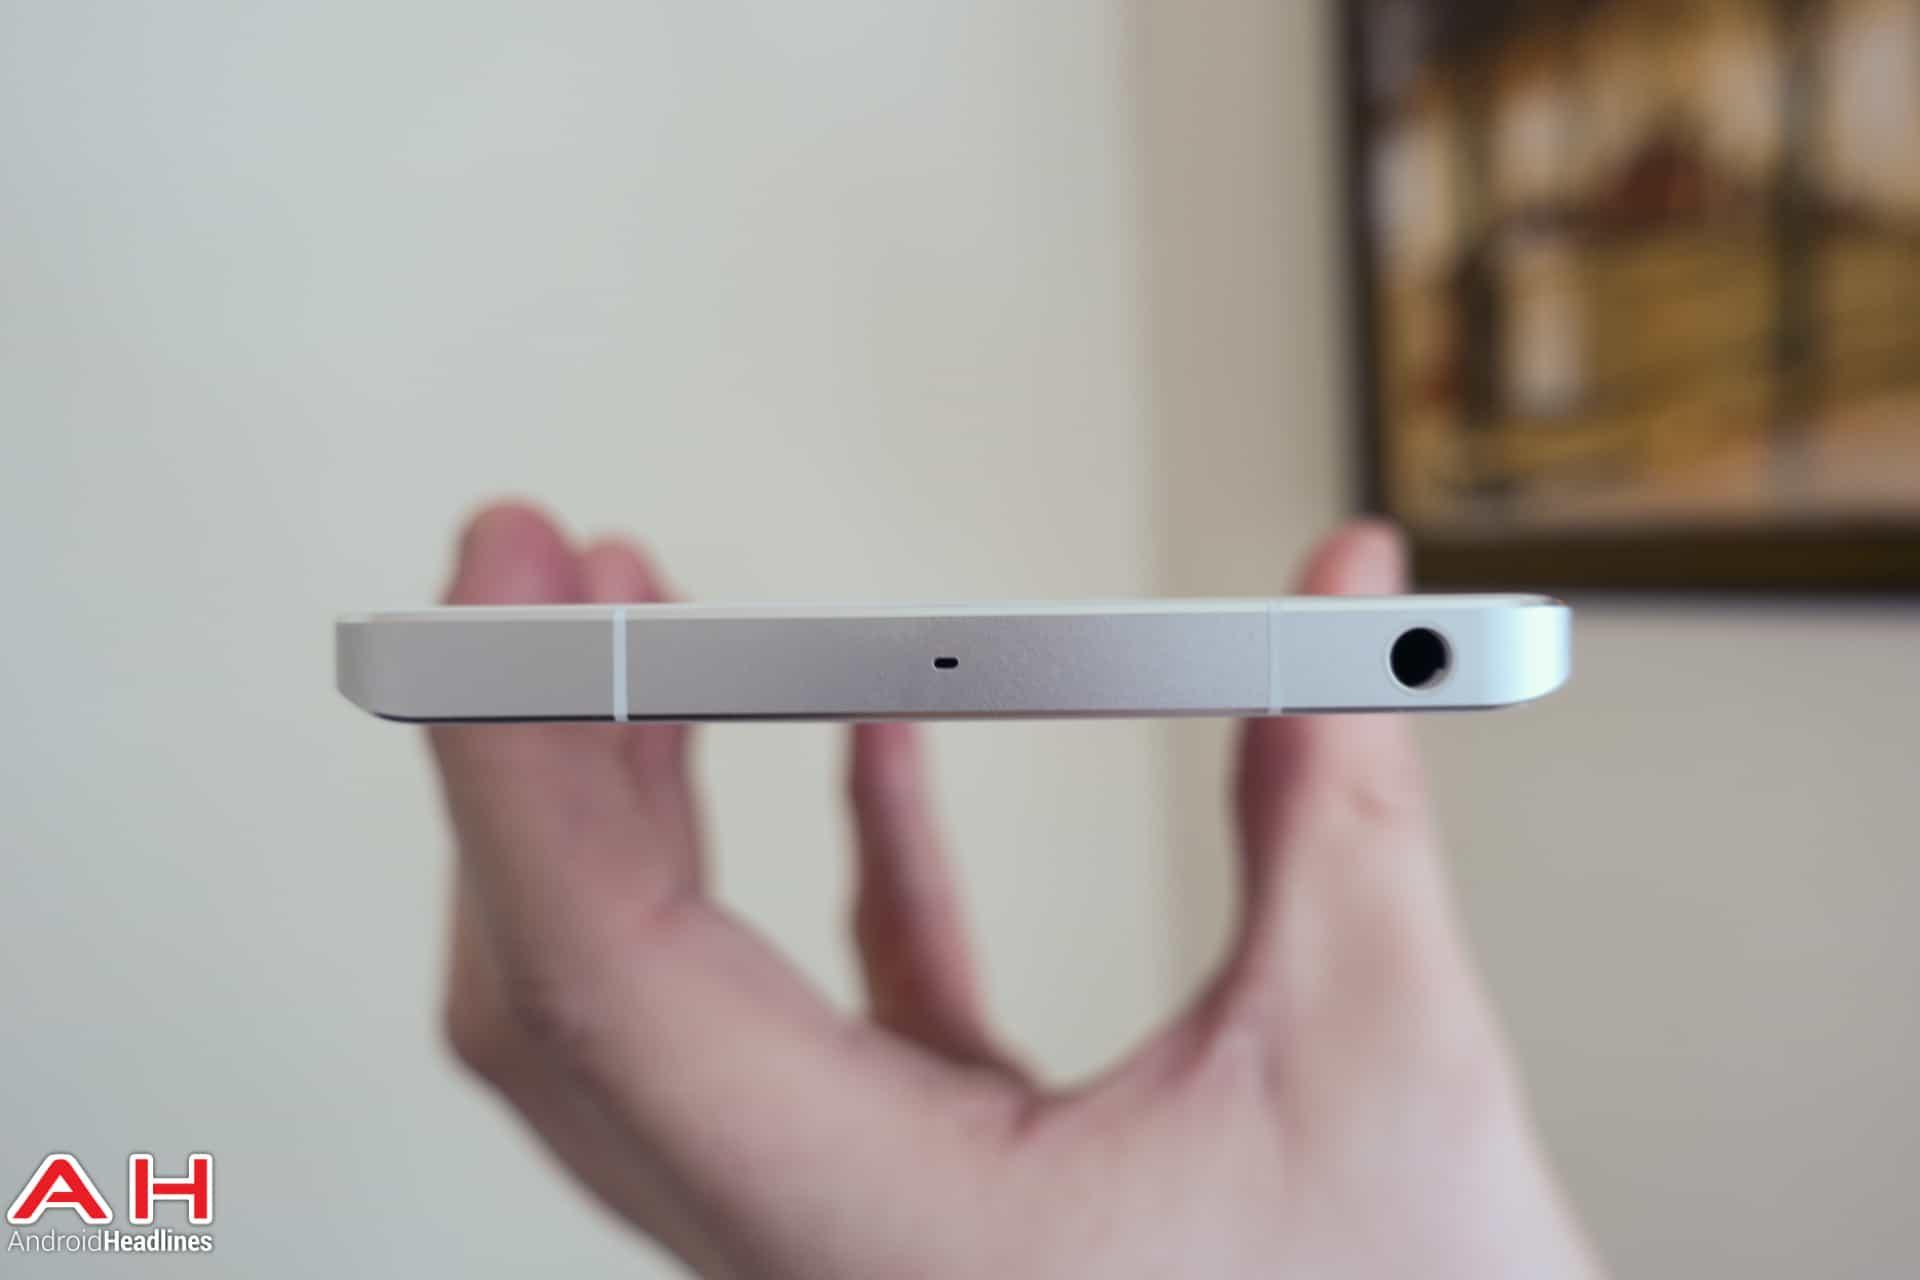 Xiaomi Mi Note AH 03789